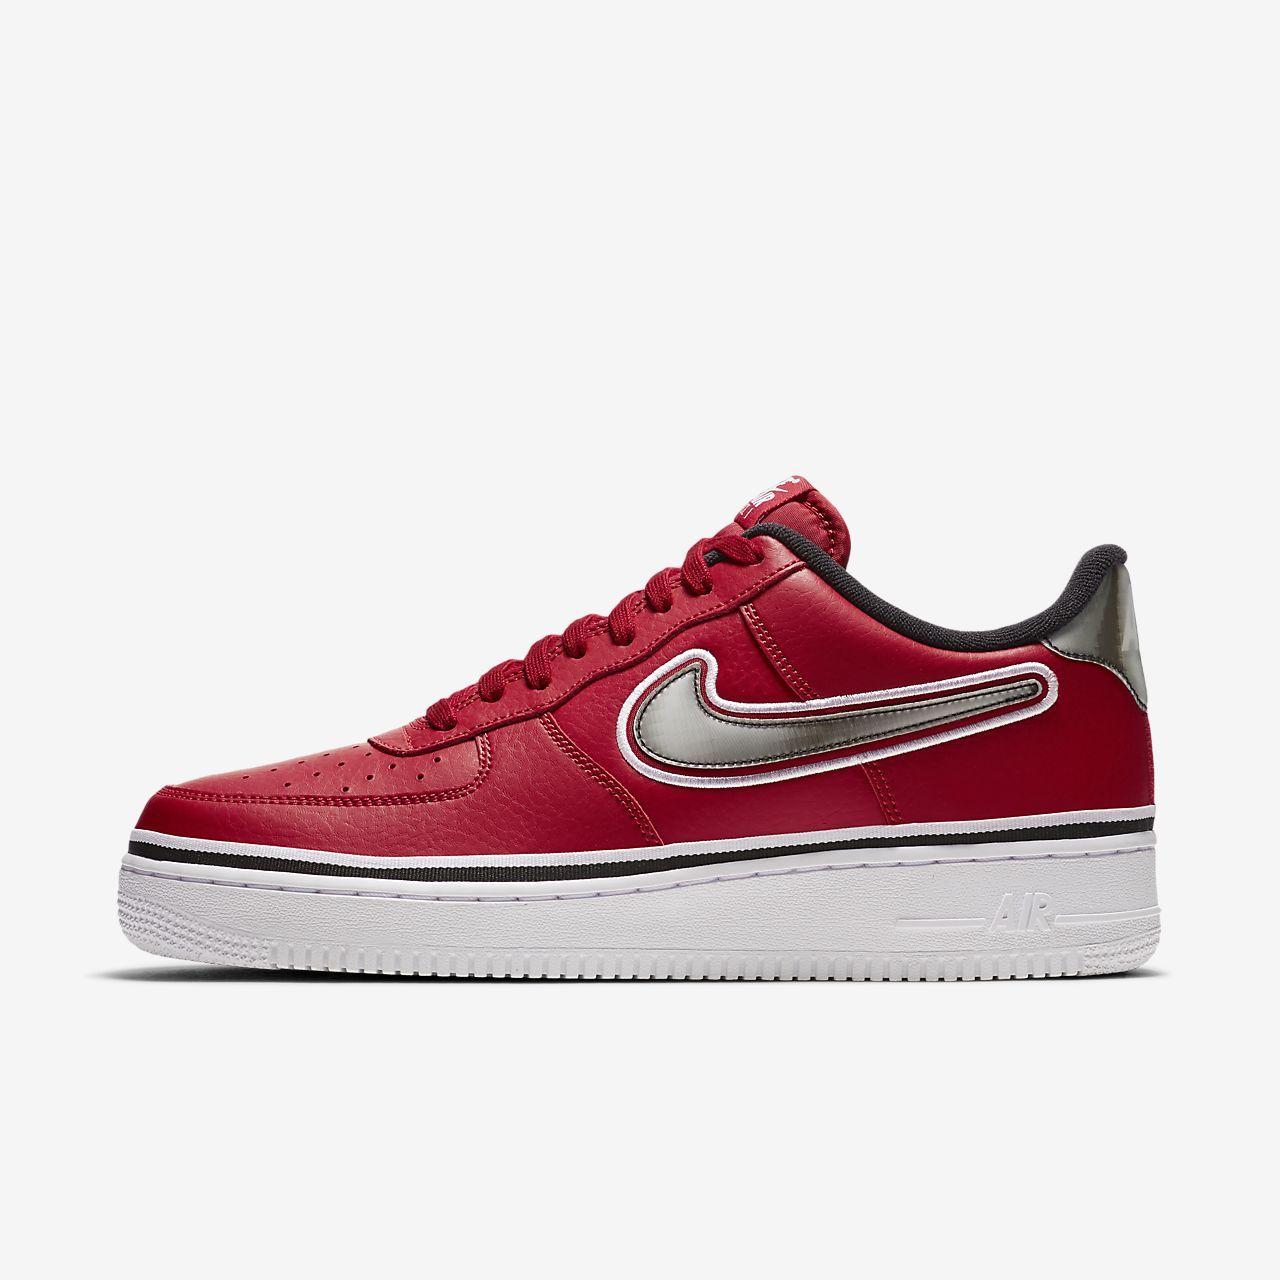 5bd92e5fb21 Nike Air Force 1 NBA Low (Chicago Bulls) Men s Shoe